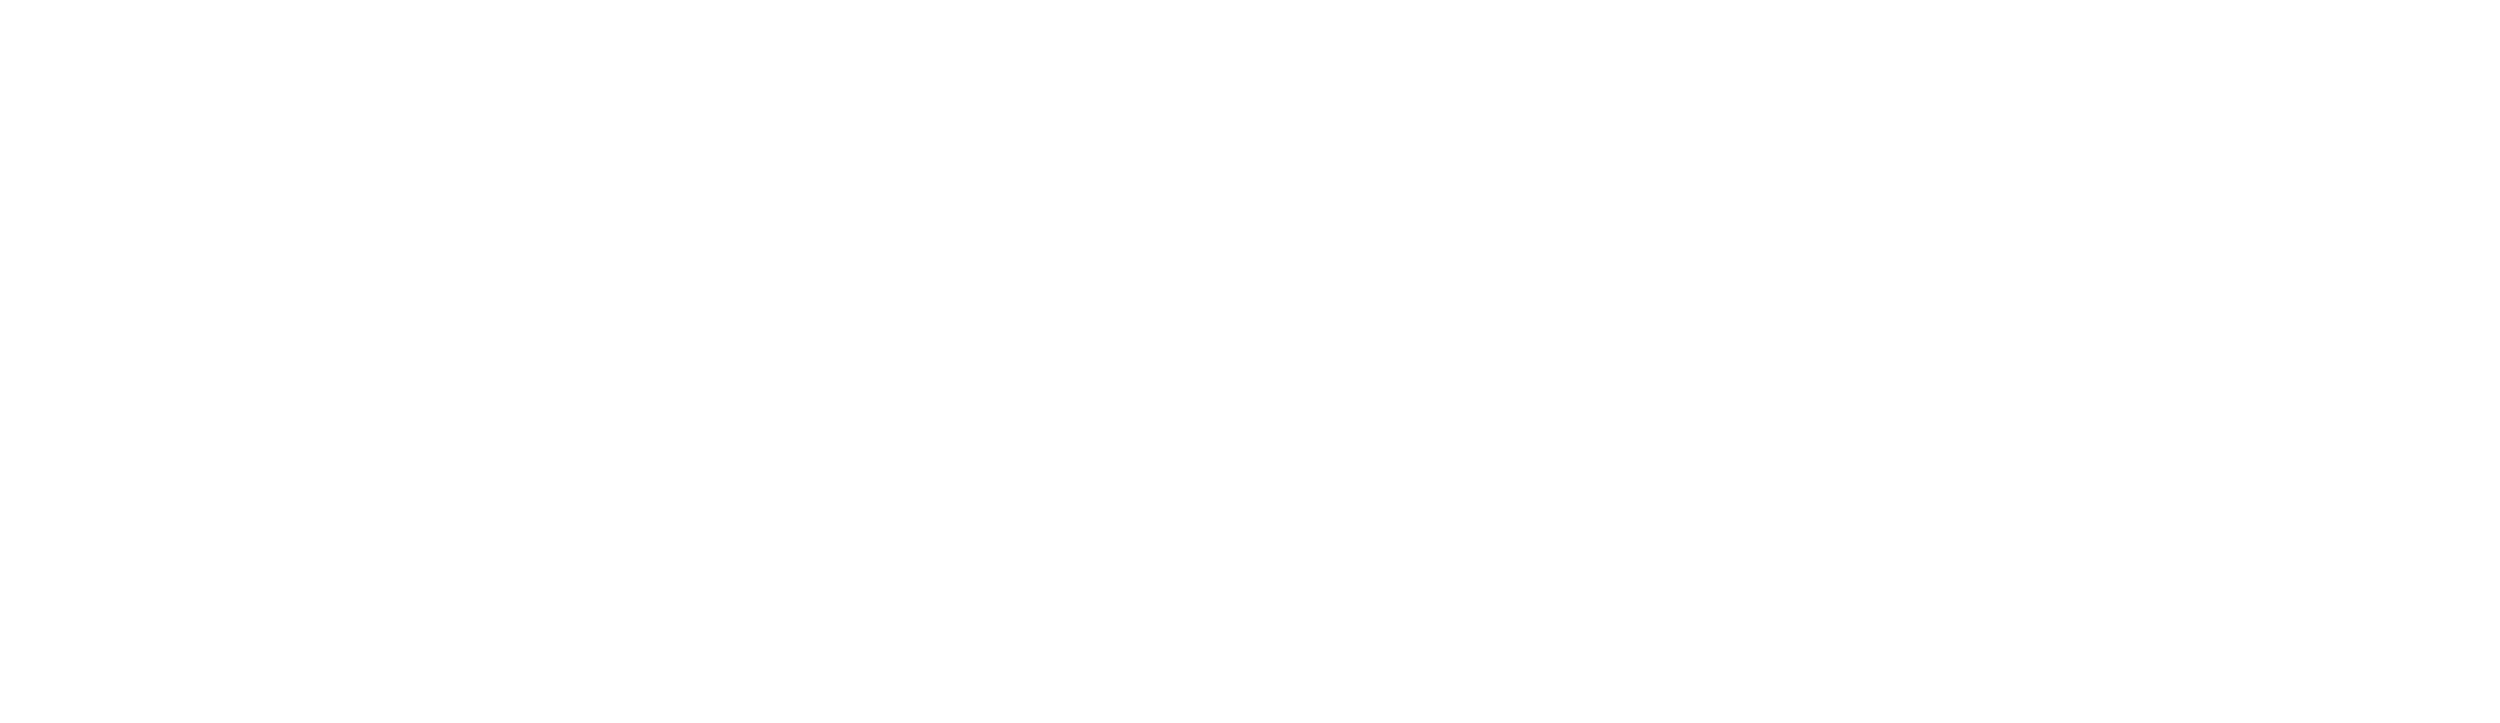 happyhunting3.png